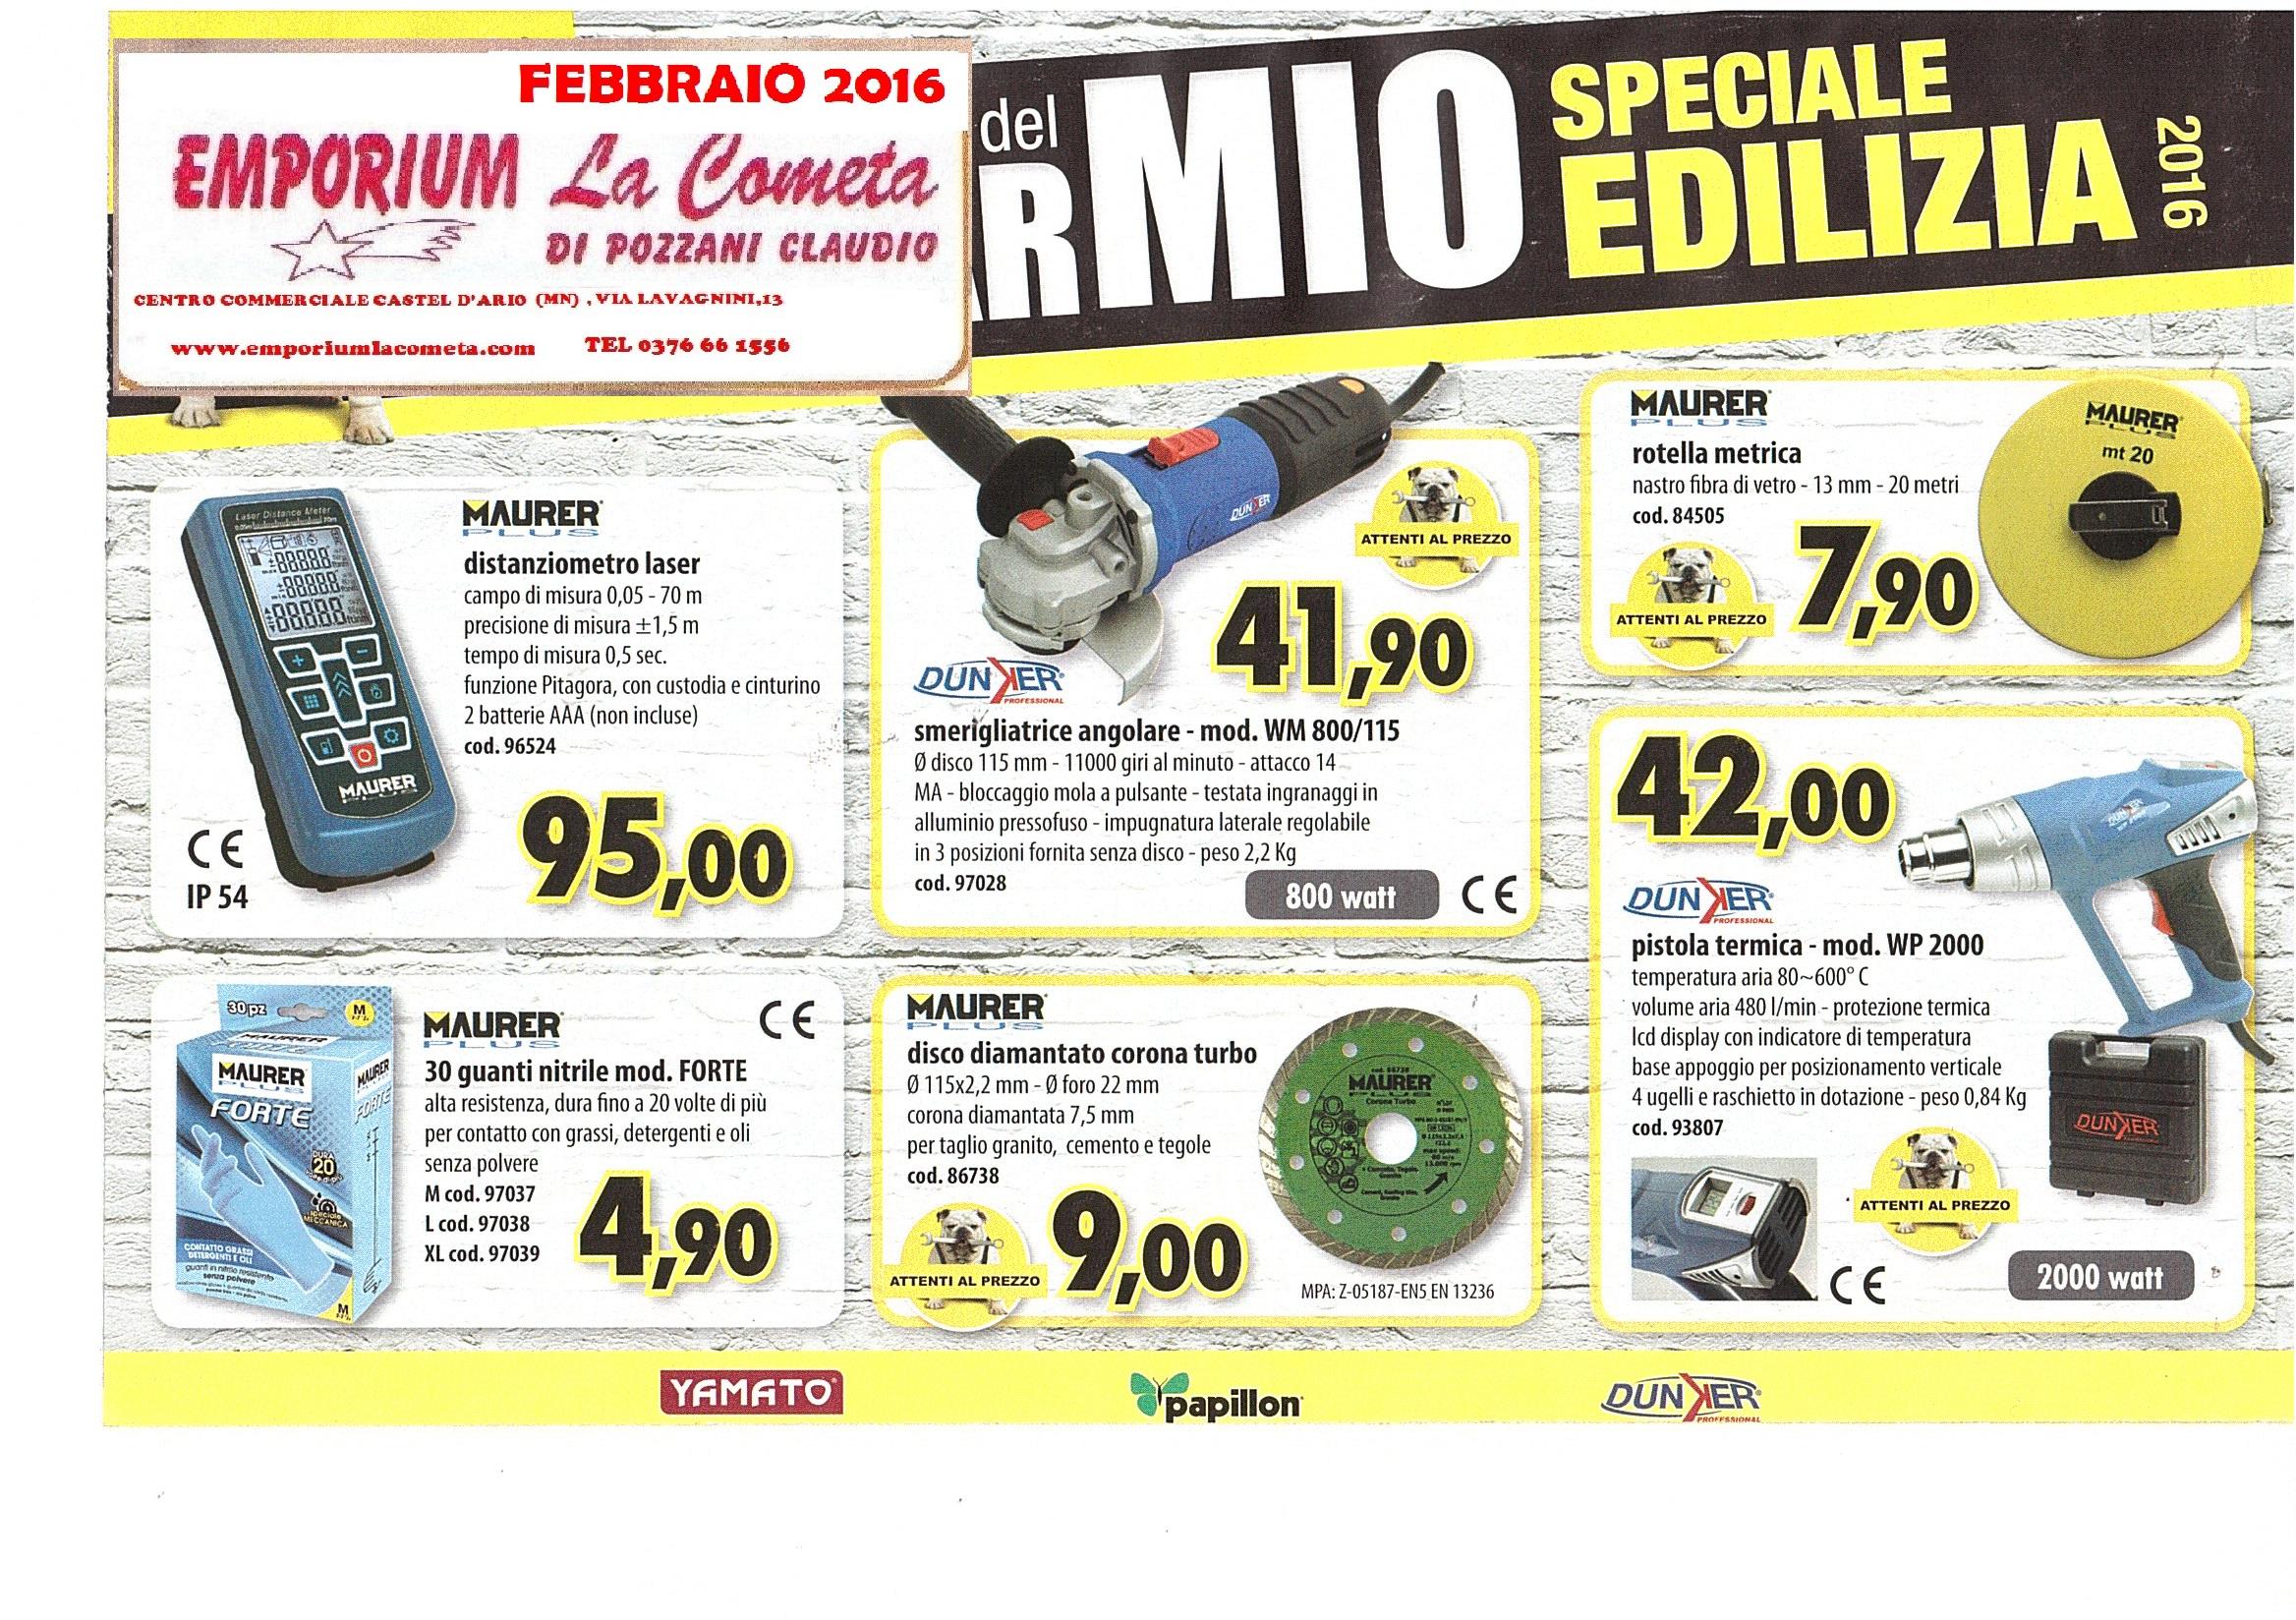 gazzetta-edilizia-01-2016-pag-1.jpg